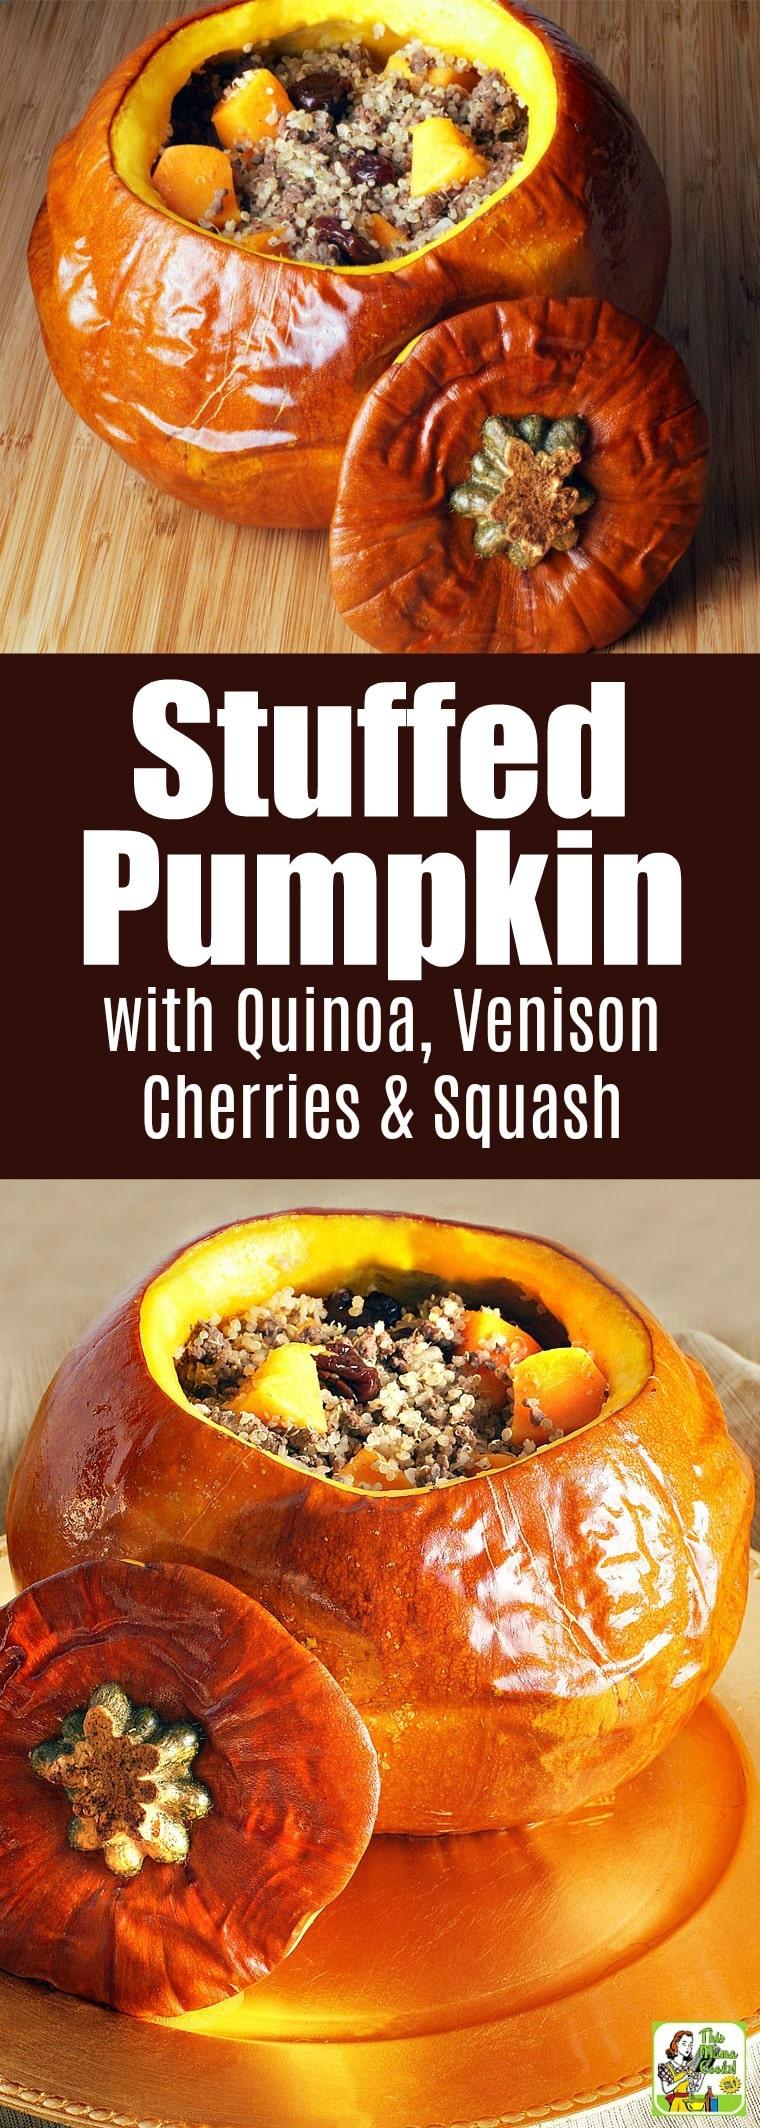 Quinoa Stuffed Pumpkin Recipe with Venison, Cherries & Squash